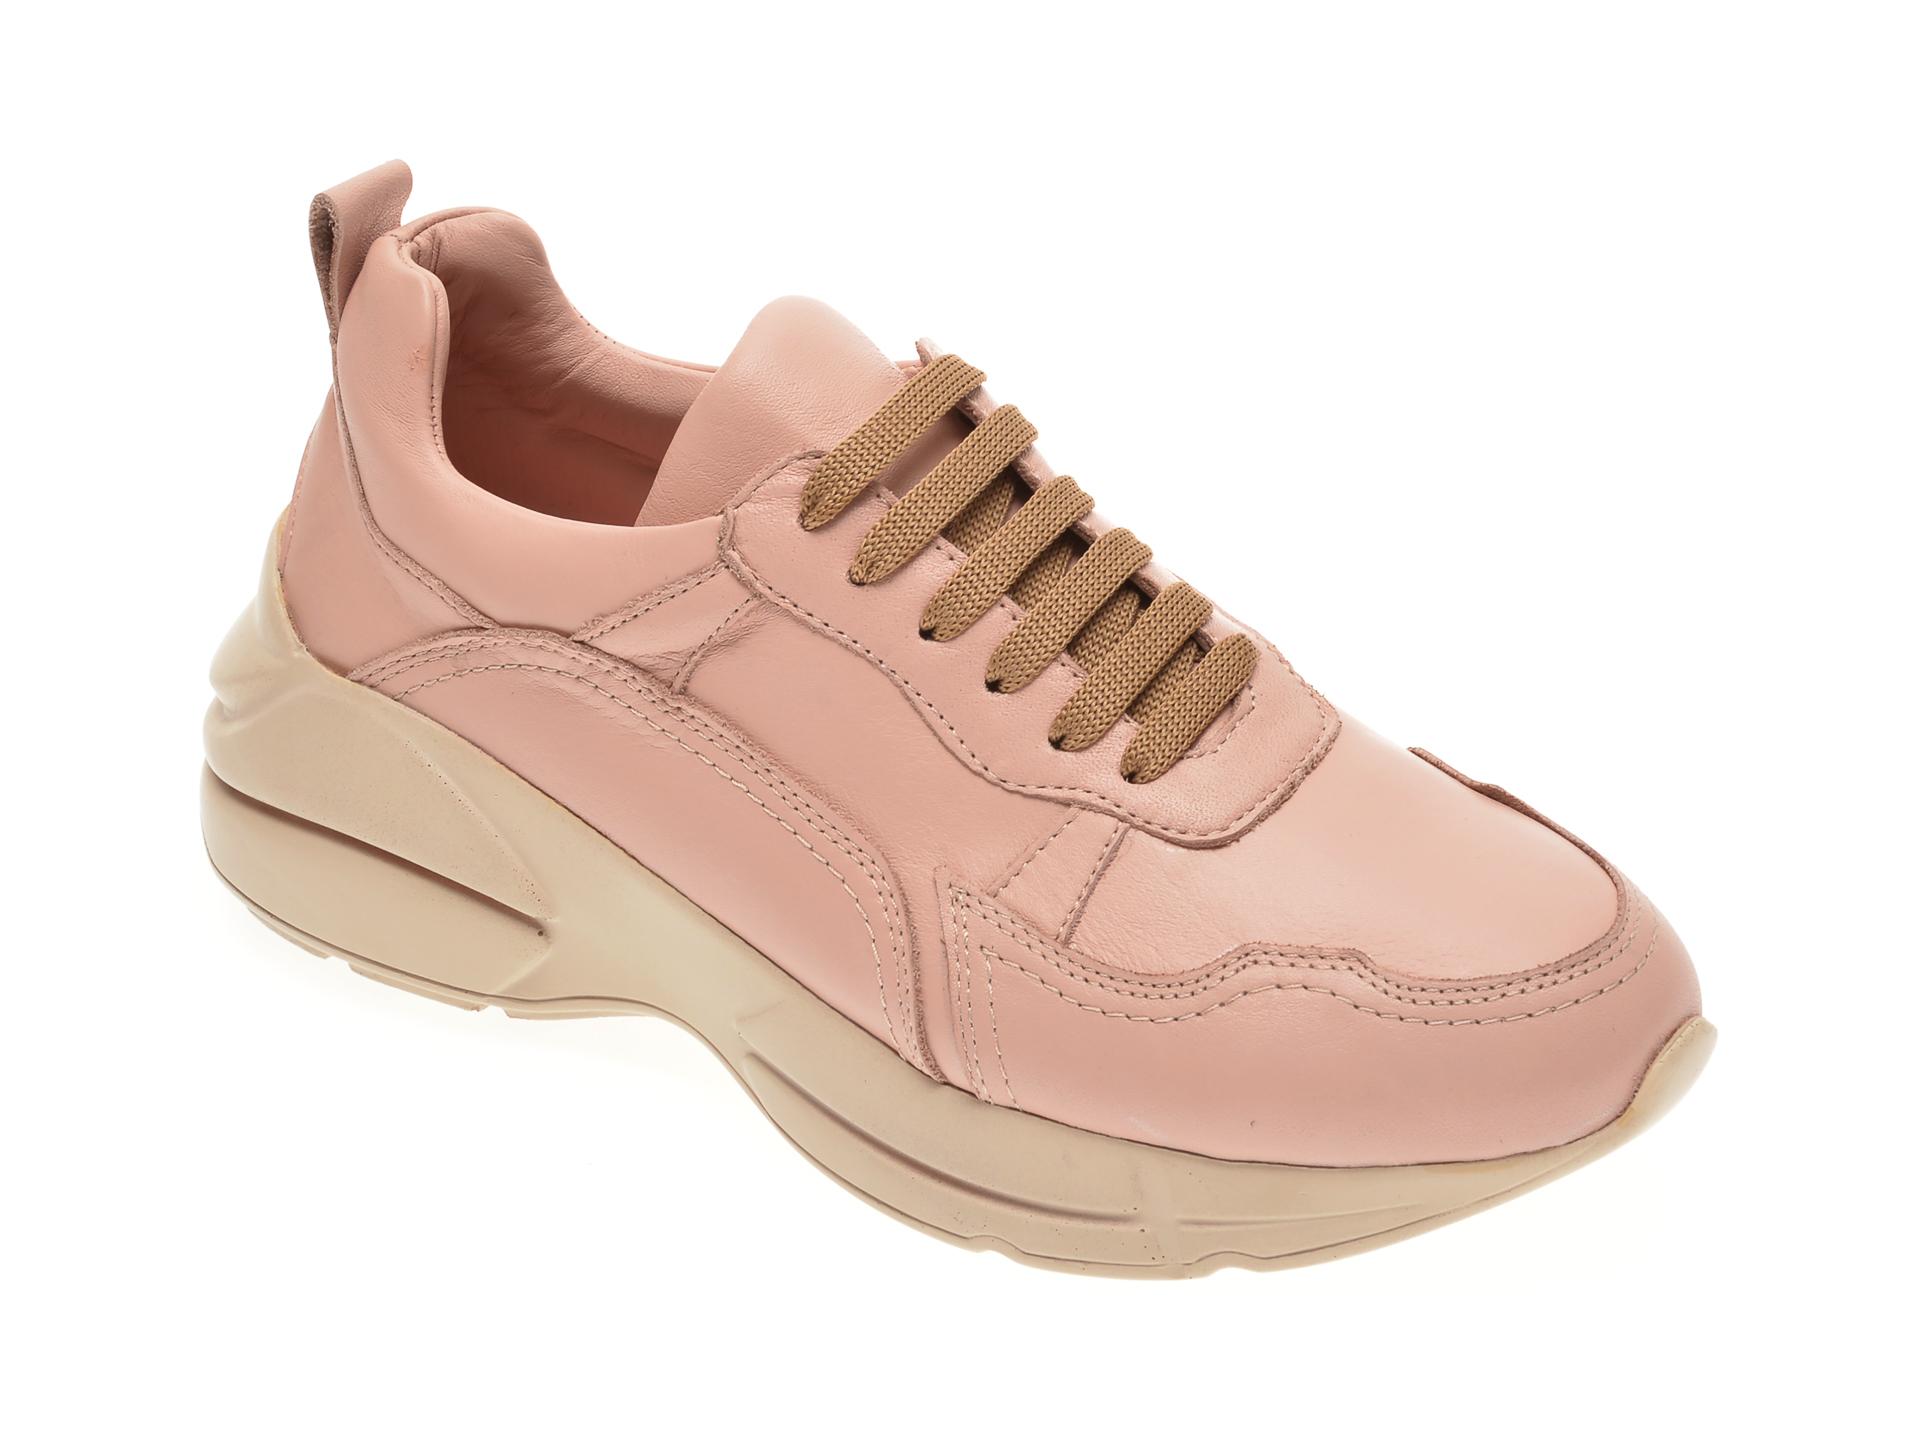 Pantofi FLAVIA PASSINI roz, 125950, din piele naturala